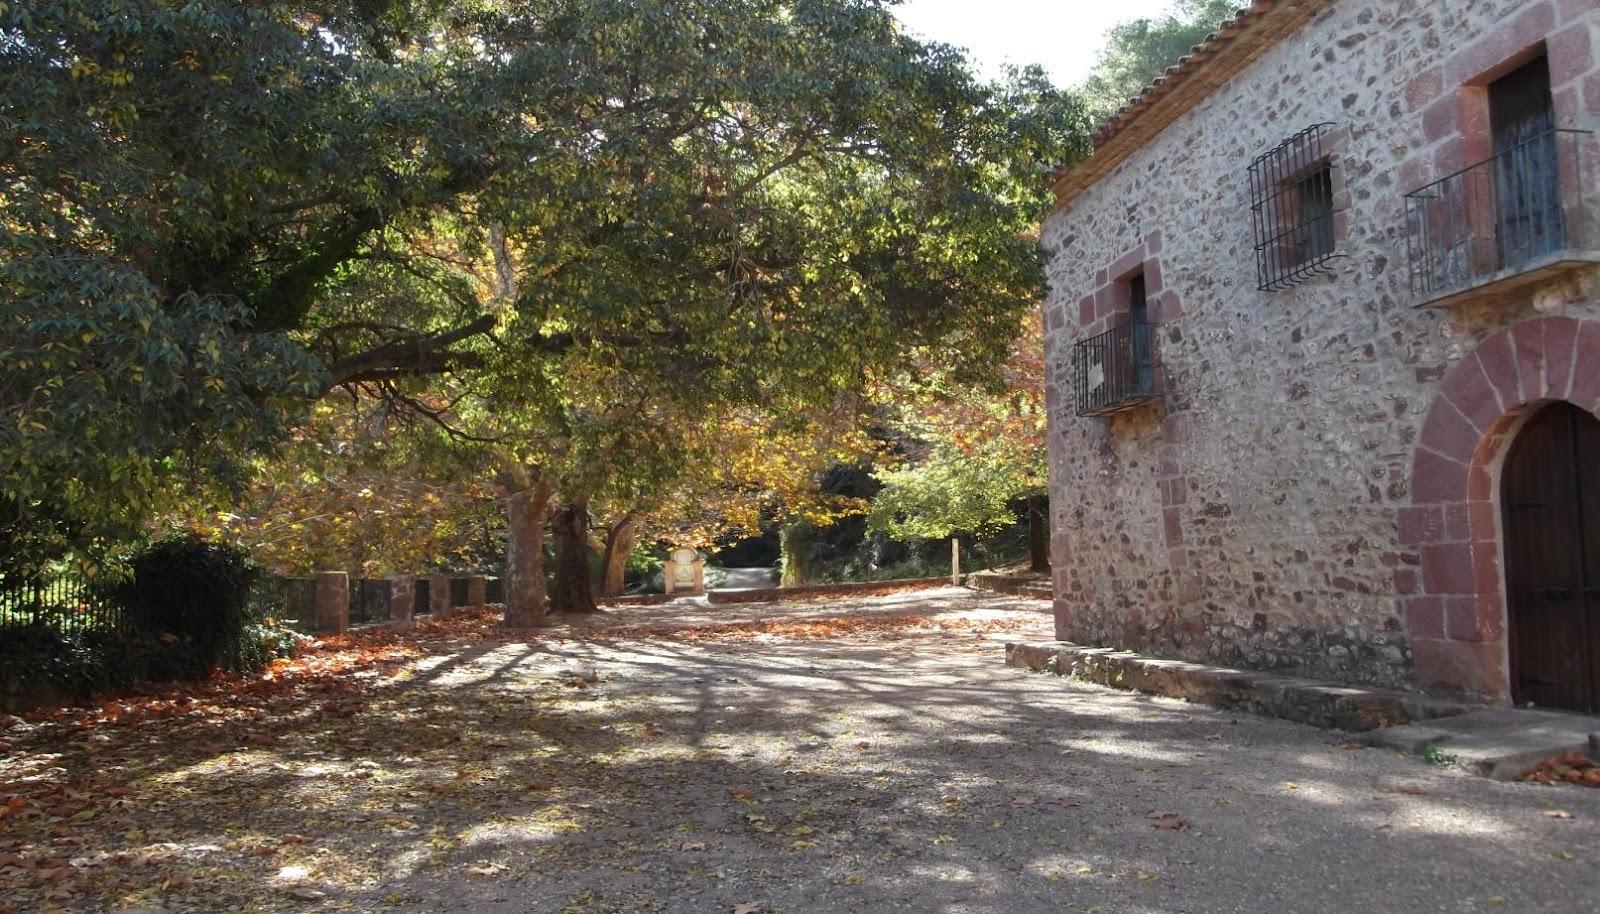 C:\Users\Juan Antonio\Pictures\Salamanca\DSCF3768.JPG